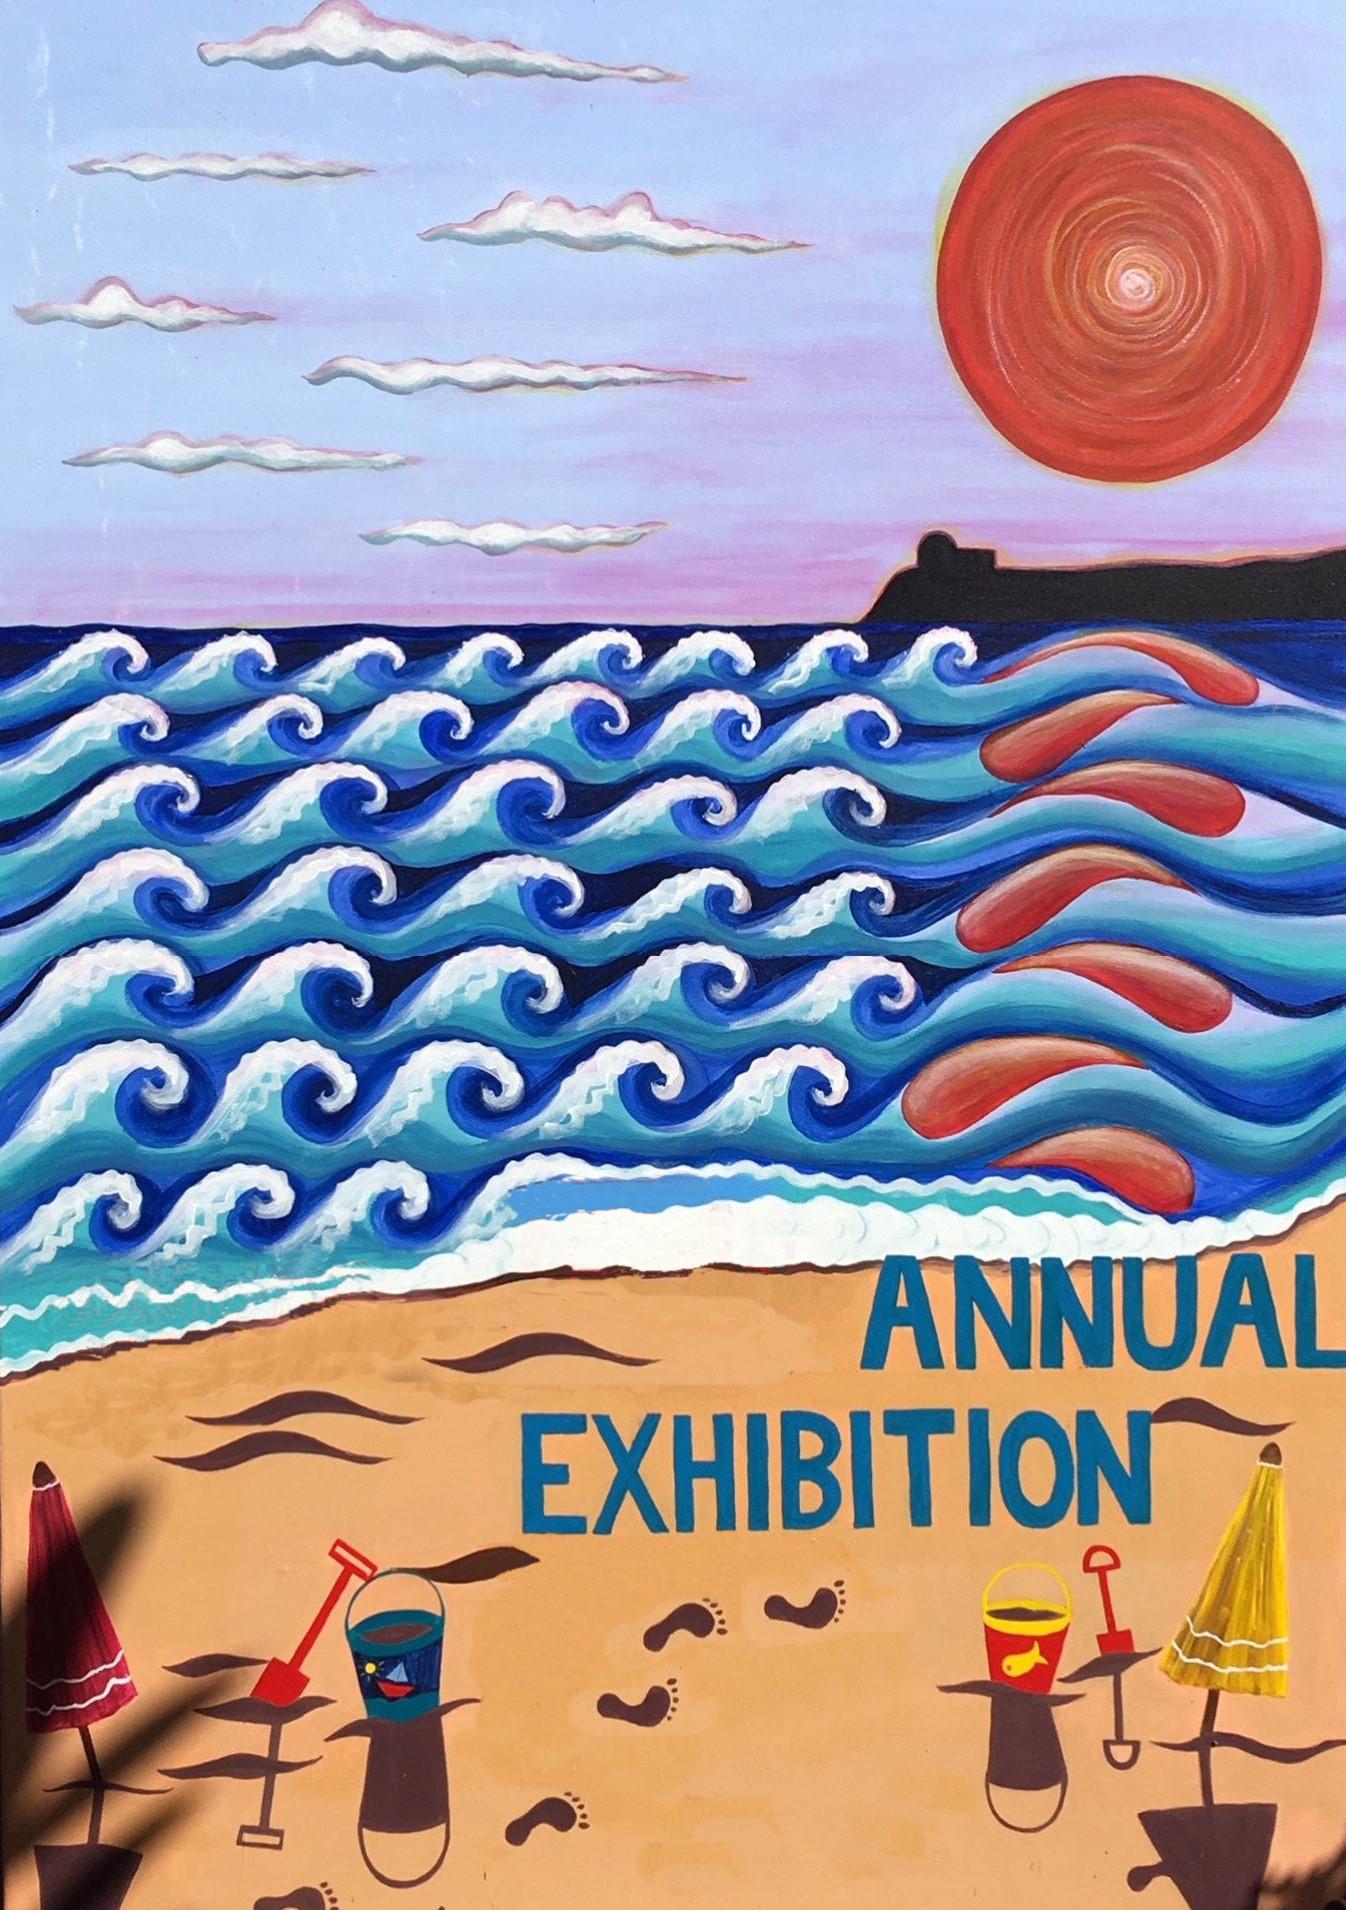 Art exhibition banner image